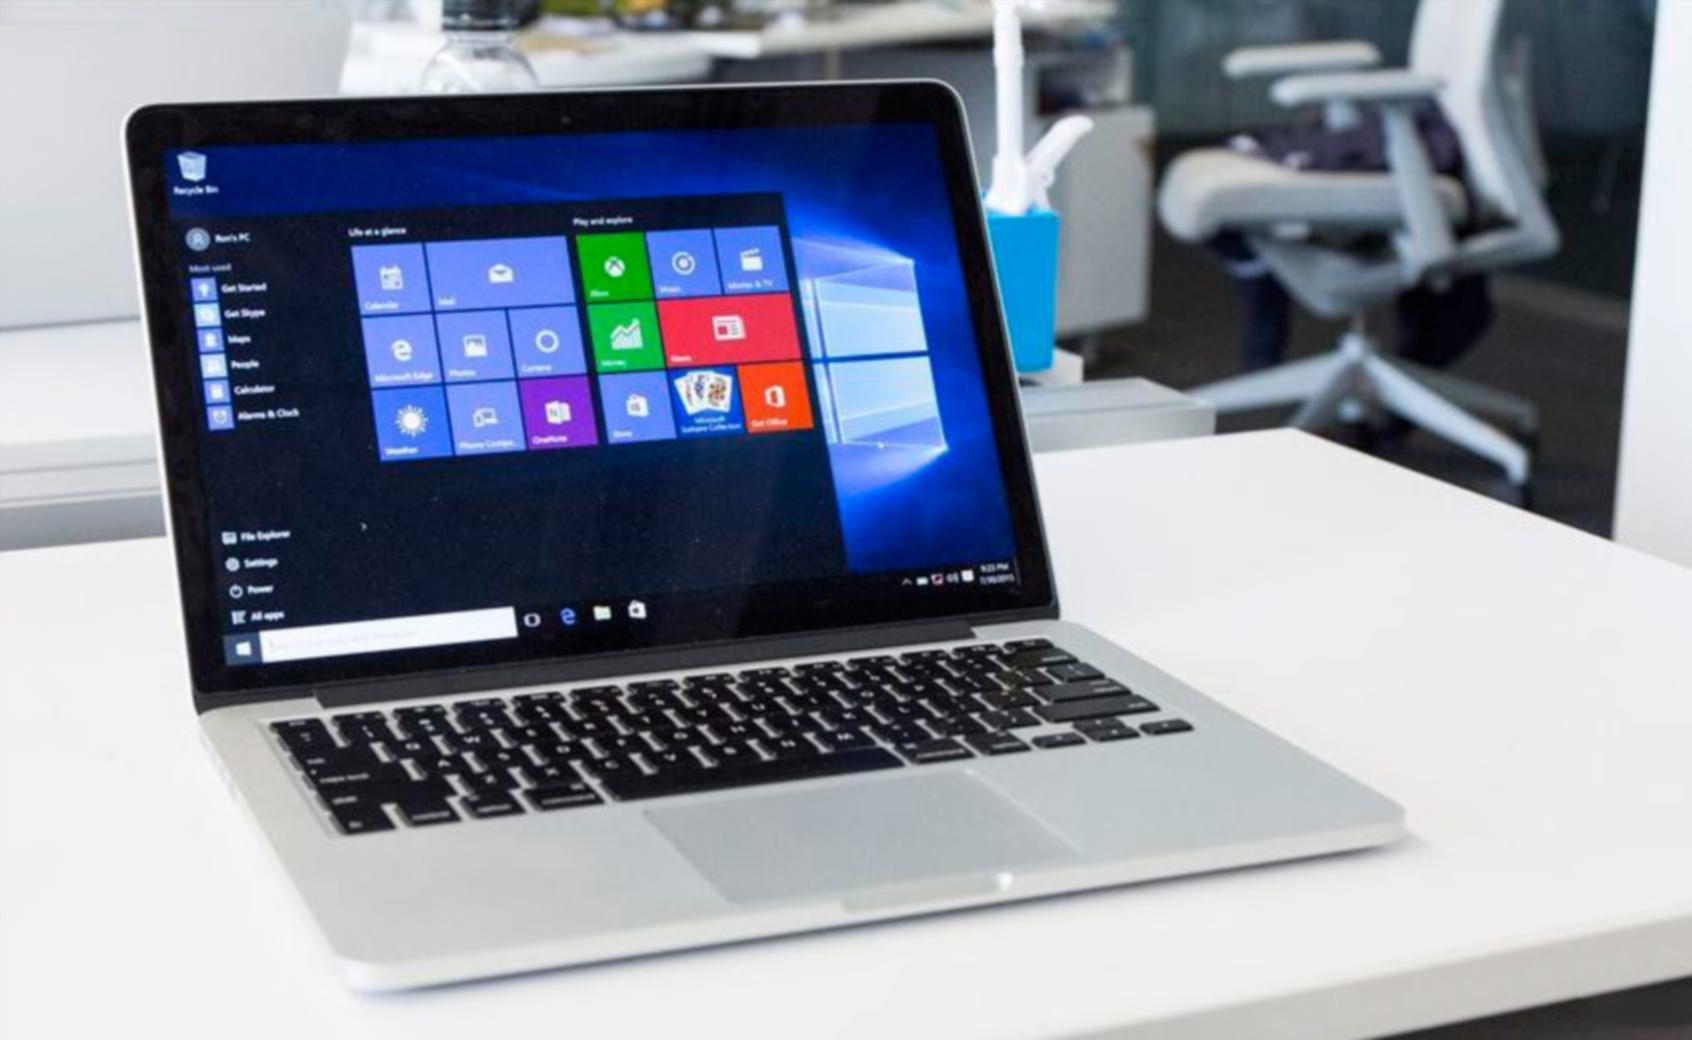 Microsoft разрешит обновляться до Windows 10 абсолютно всем, но это не легализует пиратские копии